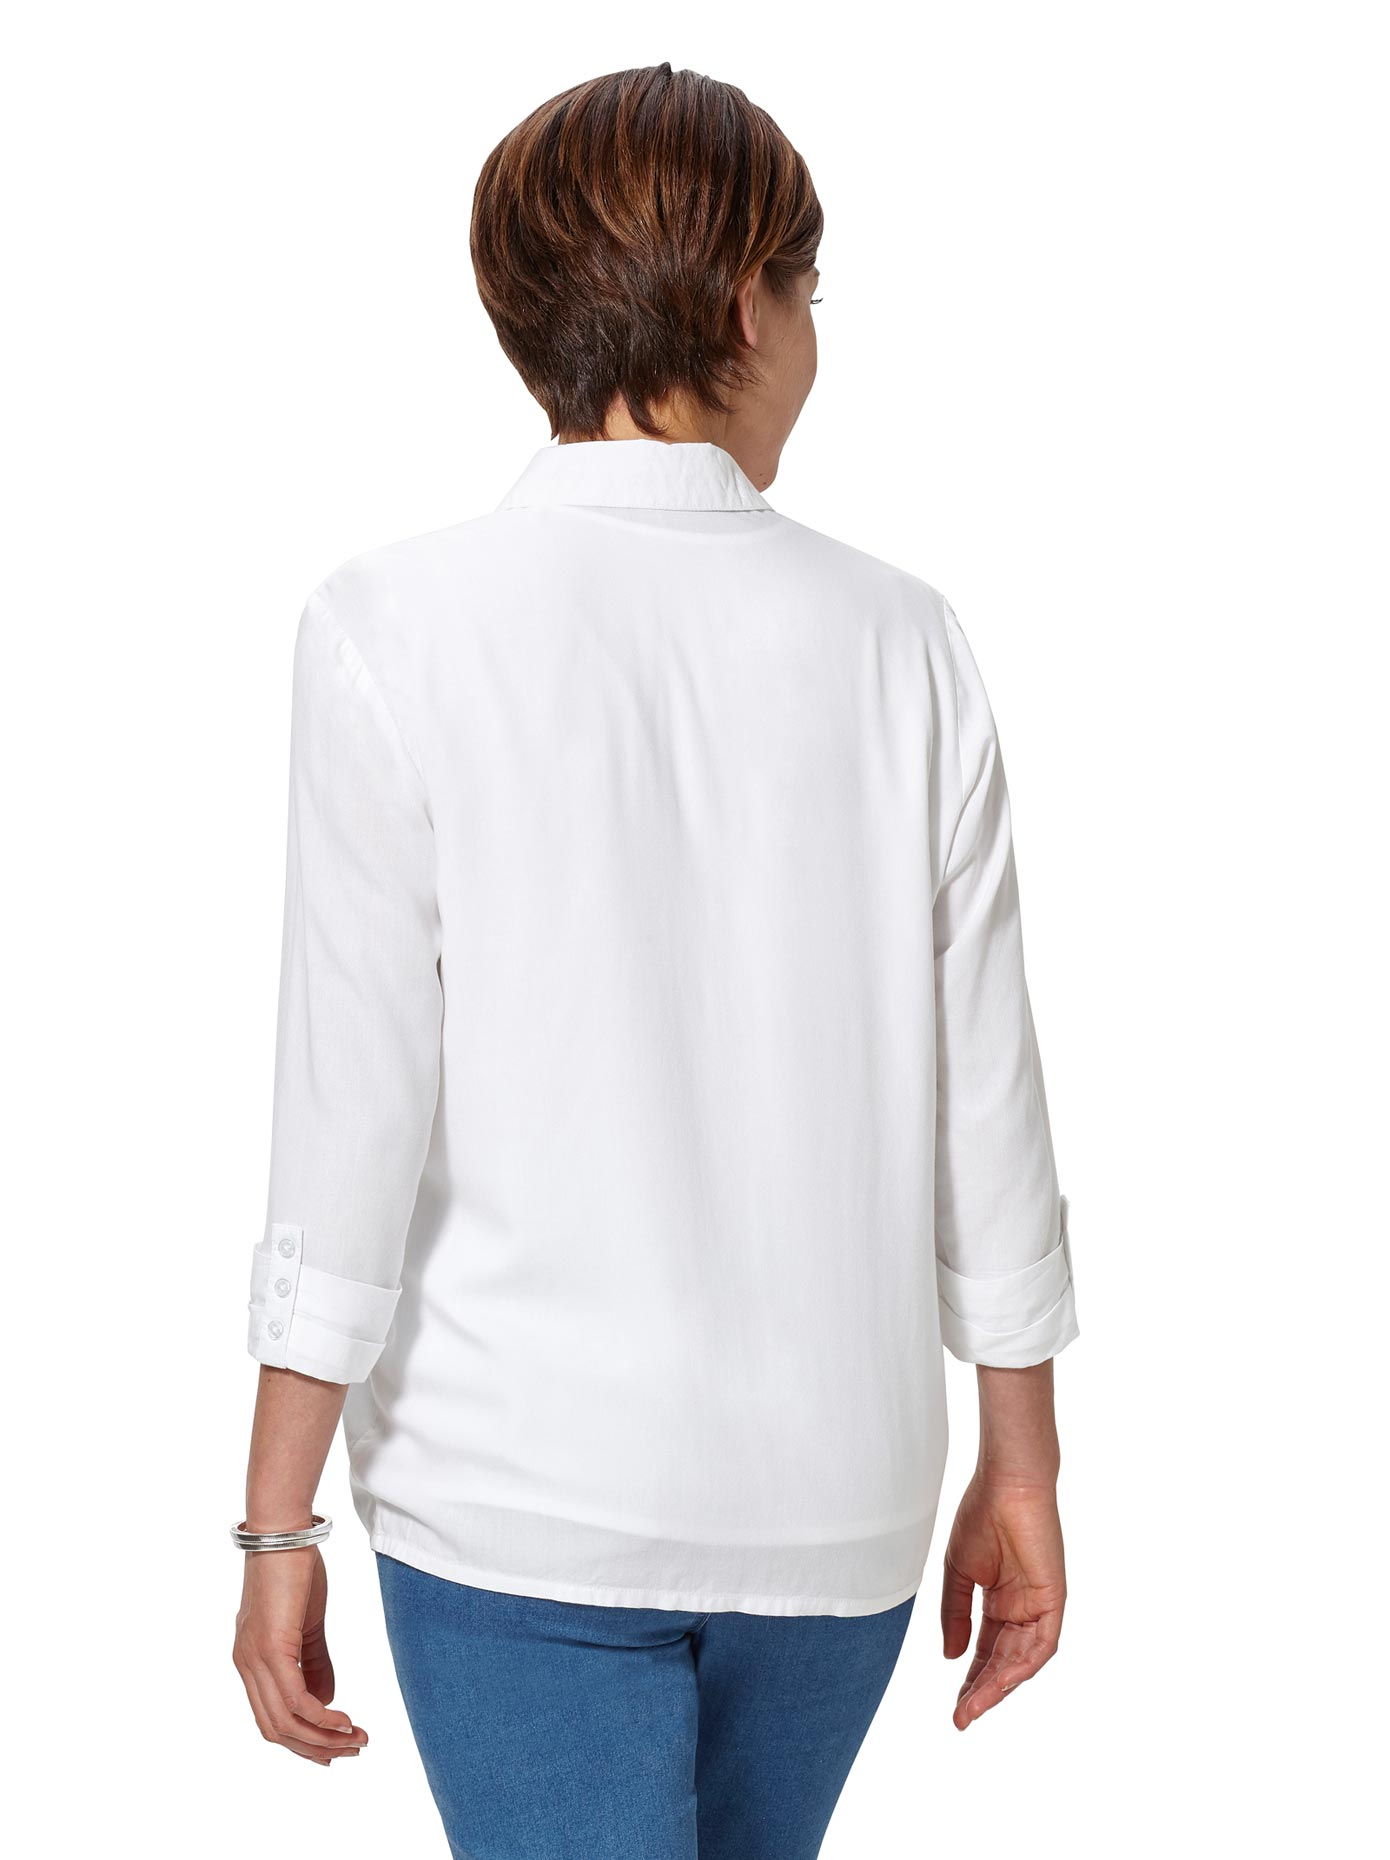 classic basics -  Blusenset: Top + Bluse in sehr trageangenehmer Viskose-Qualität